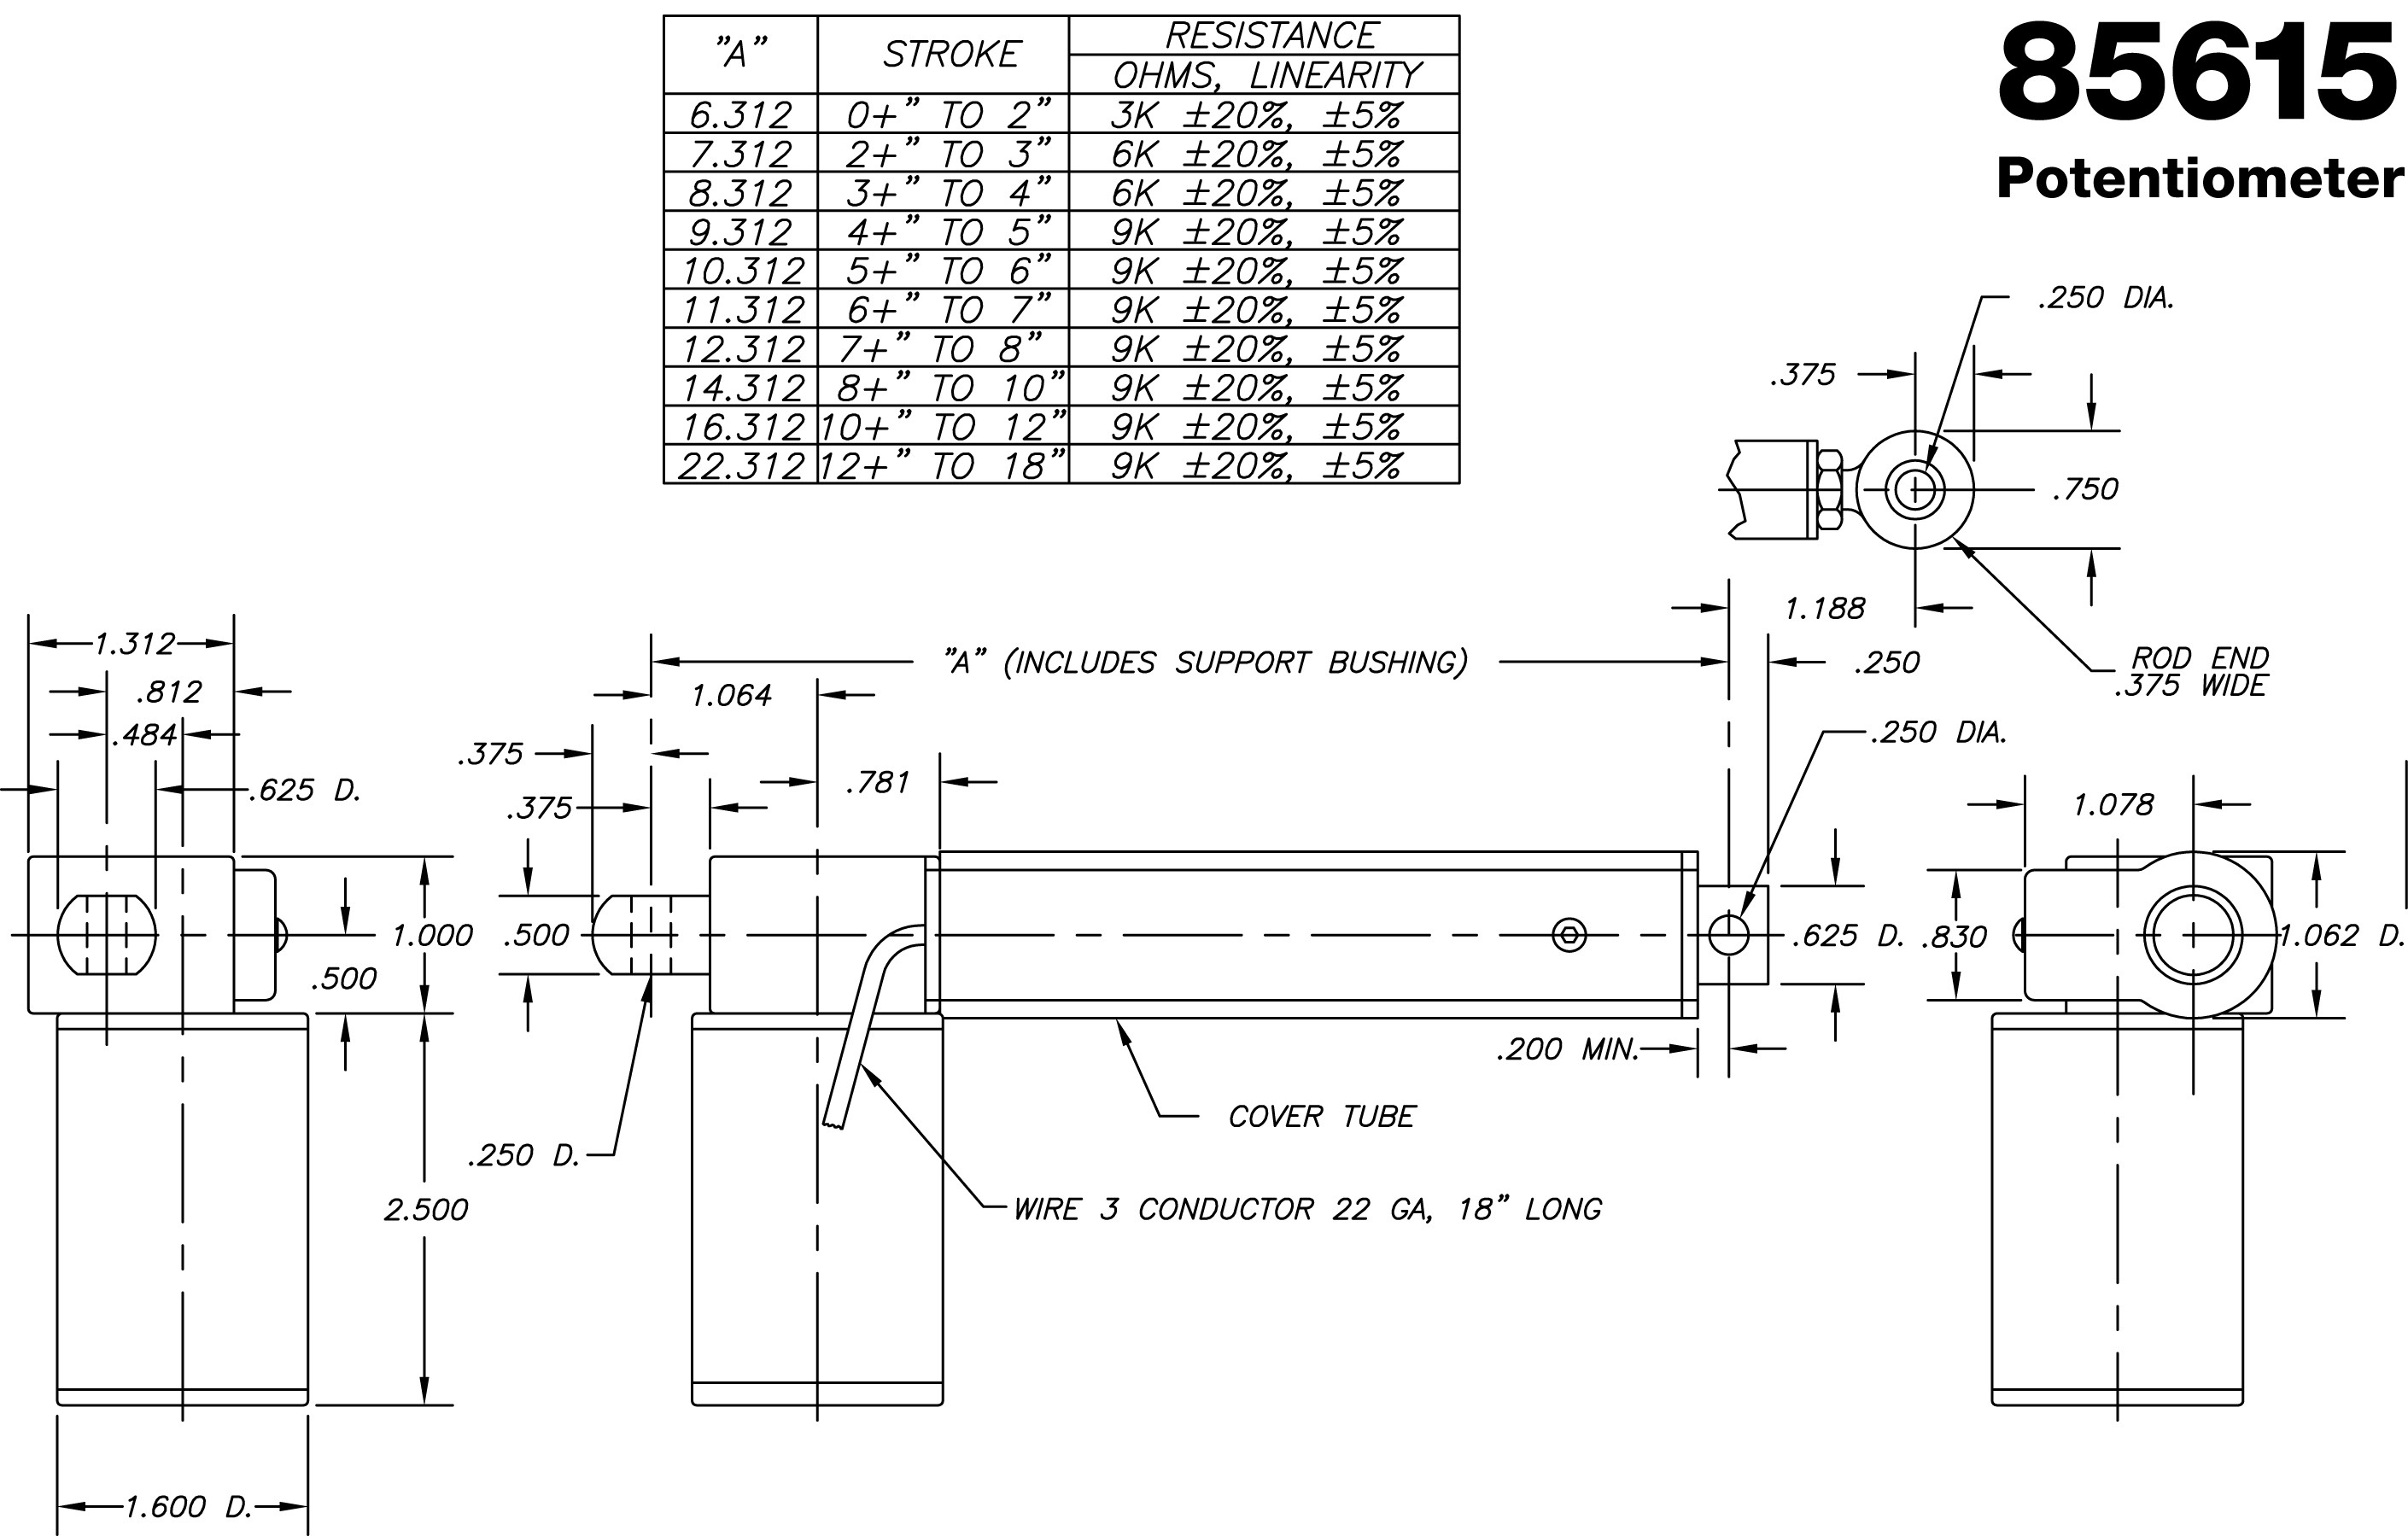 Potentiometer Circuit Diagram And Working